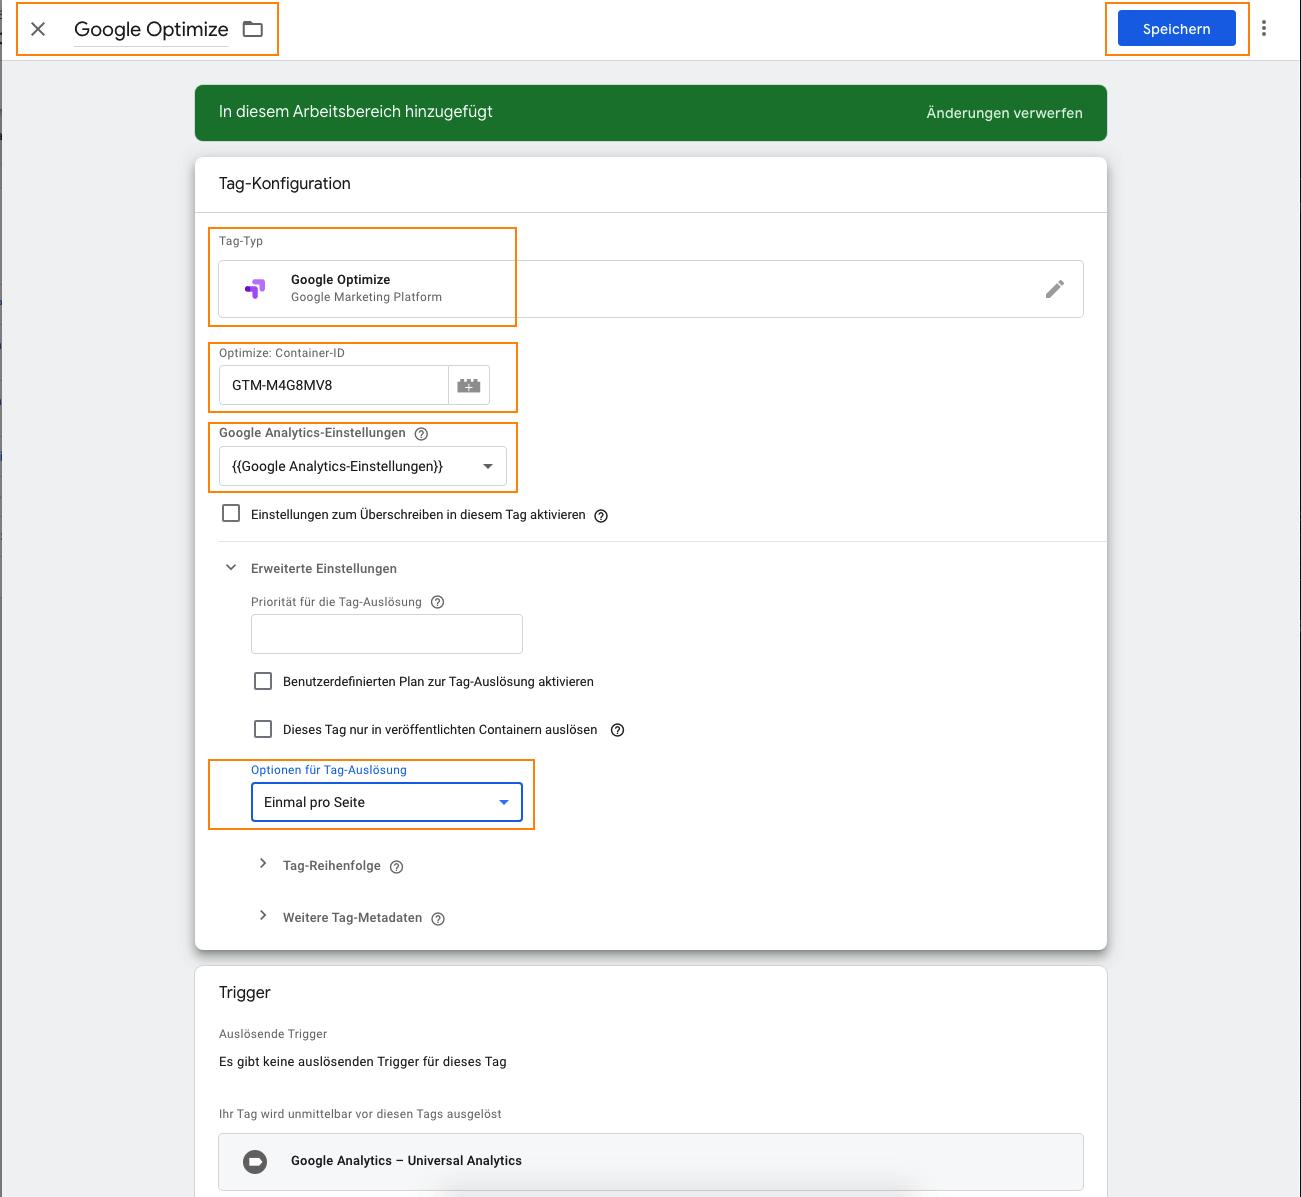 Google Optimize mit TagManager verbinden, leadgenerierung, leadgeneration, funnel, kundengewinnung, software, conversion rate, leads, marketing, fragebogen, kpi